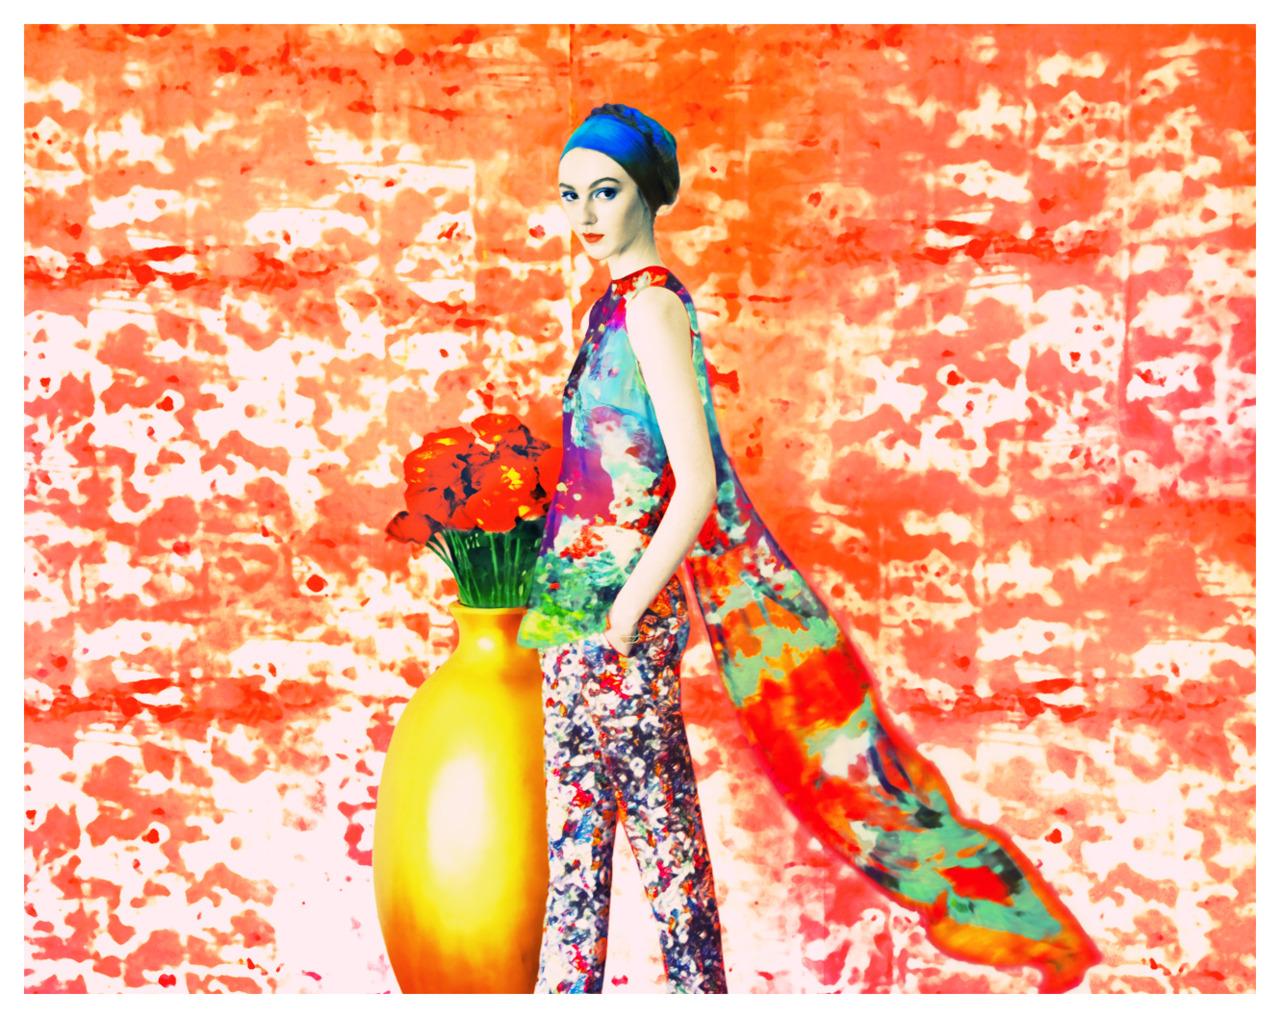 """Mary Katrantzou, Florals""   with Erik Madigan Heck + Mary Cann @ One Management + Heidi Bivens + Eli Metcalf + Tamara McNaughton + Deanna Melluso + Alina Zakaite + Young & Ng + New York + Nomenus Quarterly  Frocks = Mary Katrantzou"